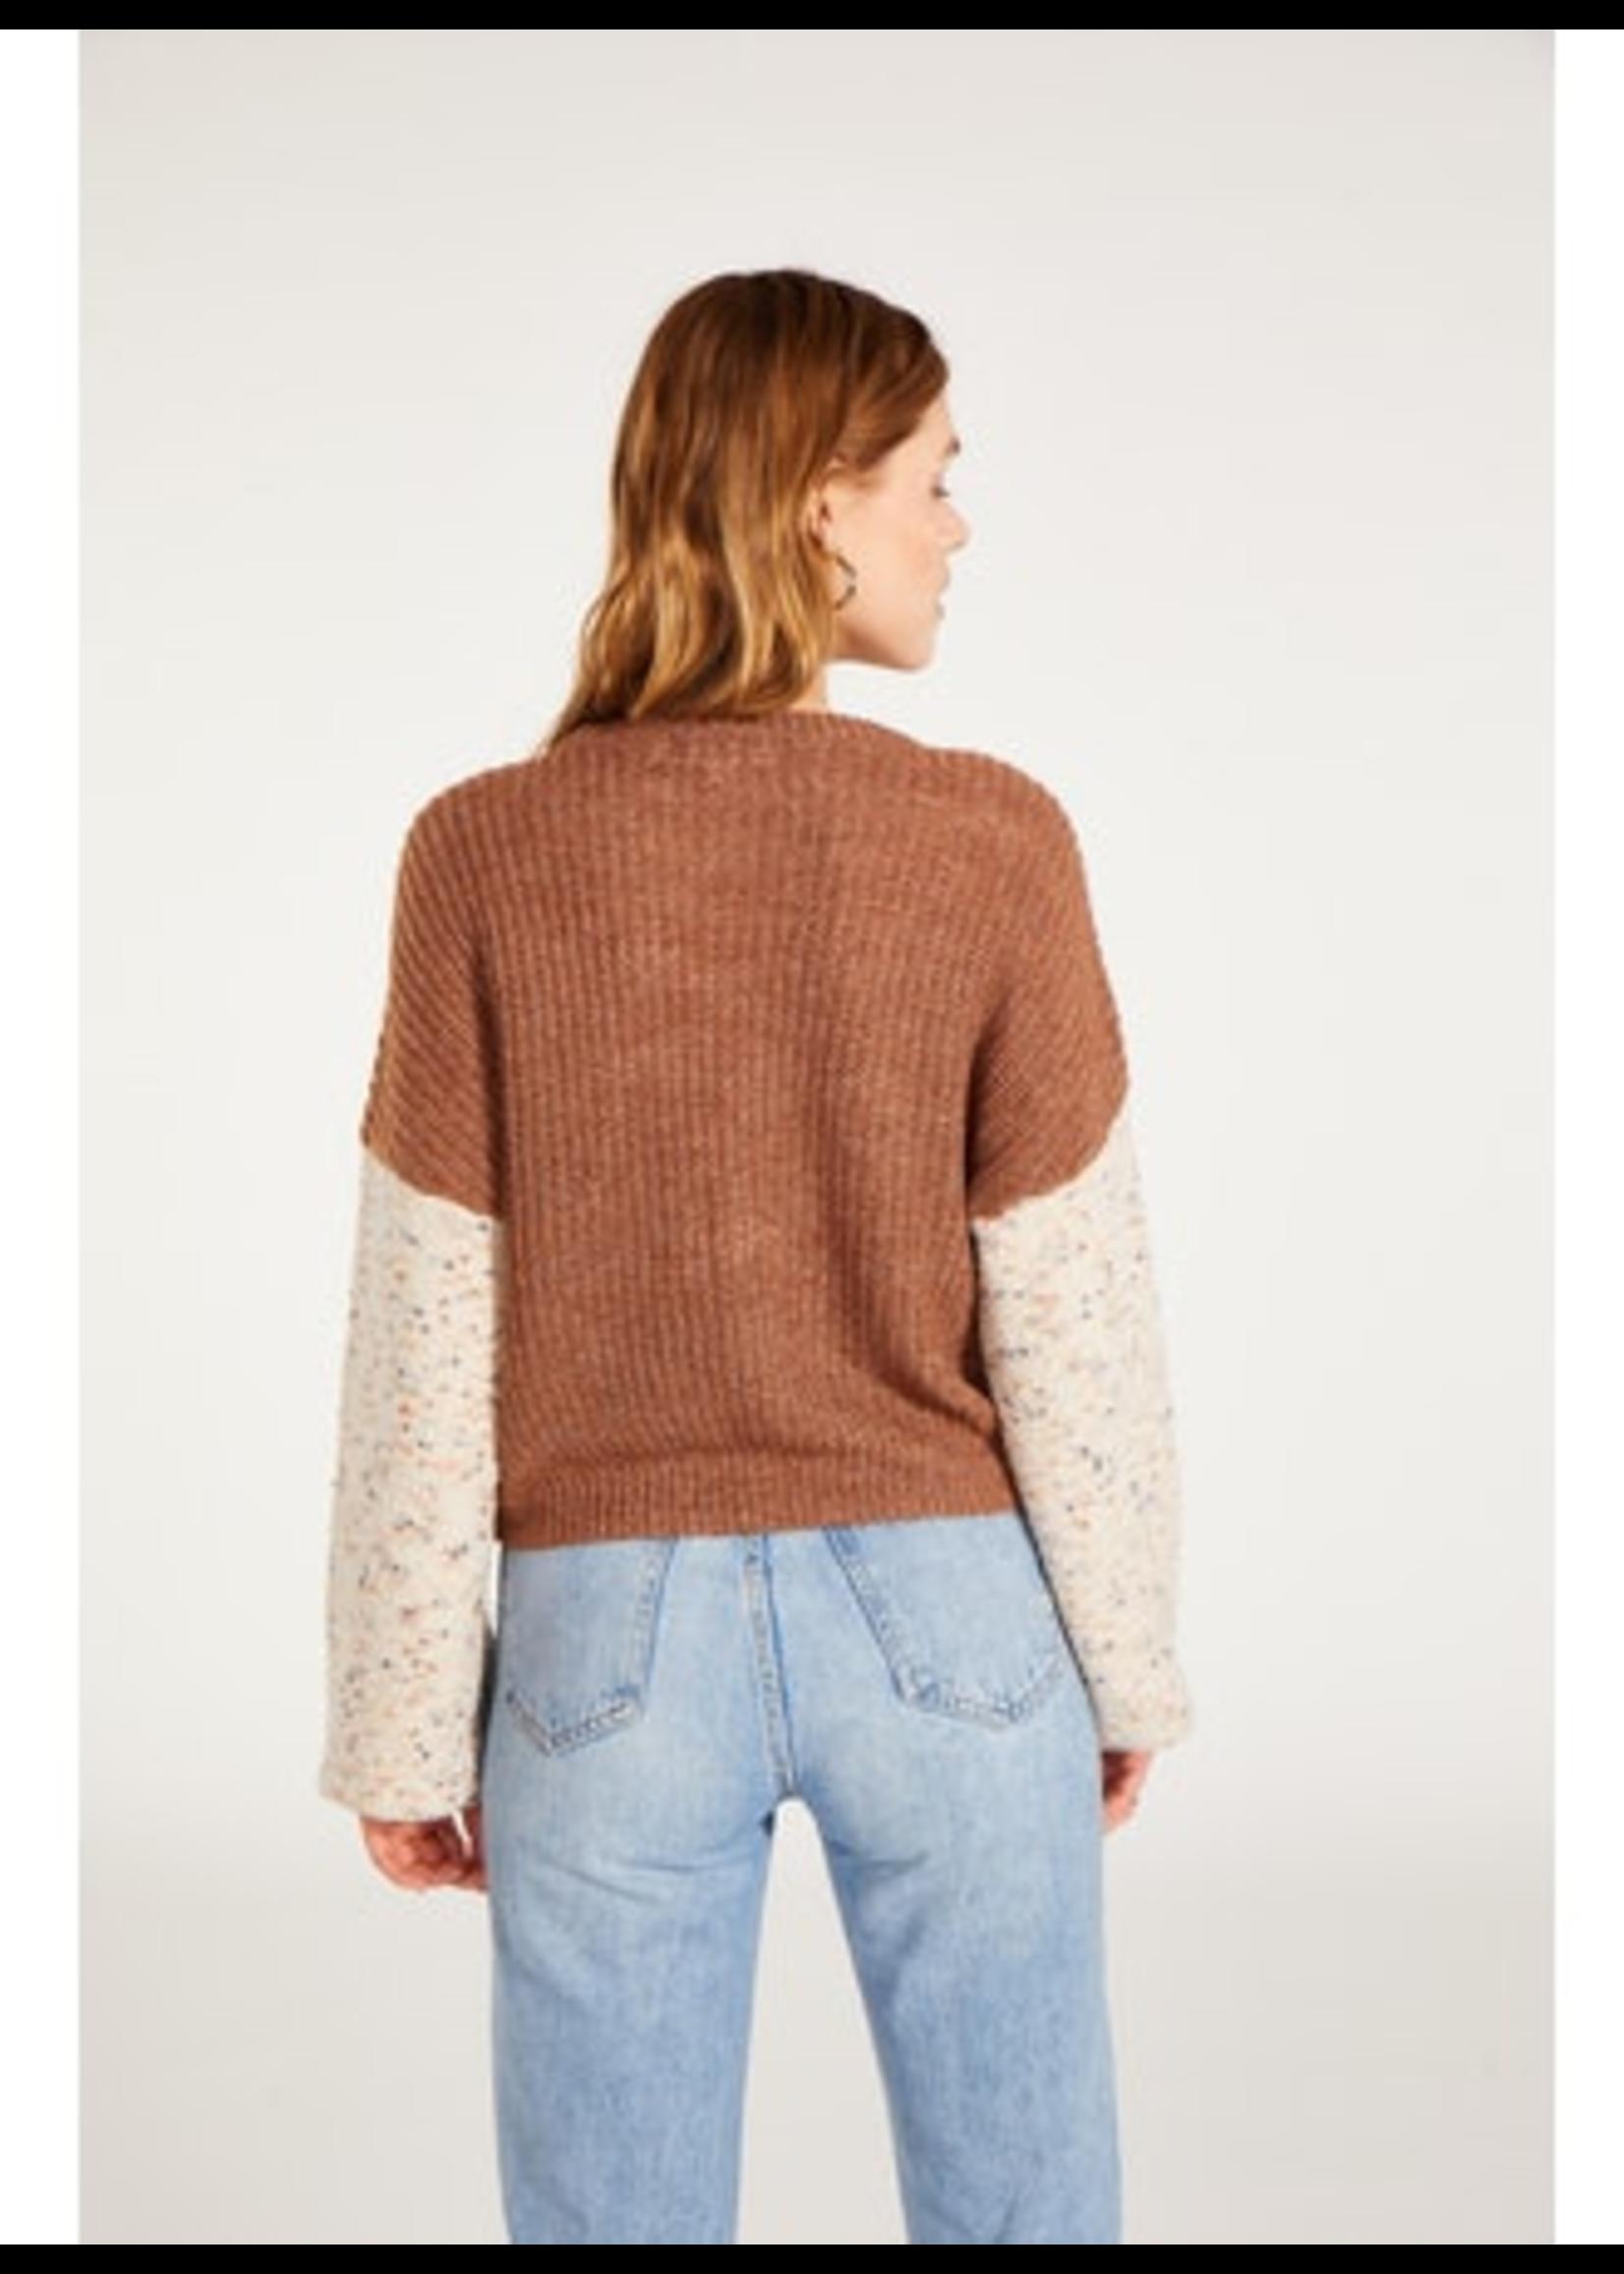 BB Dakota Writers Sweater